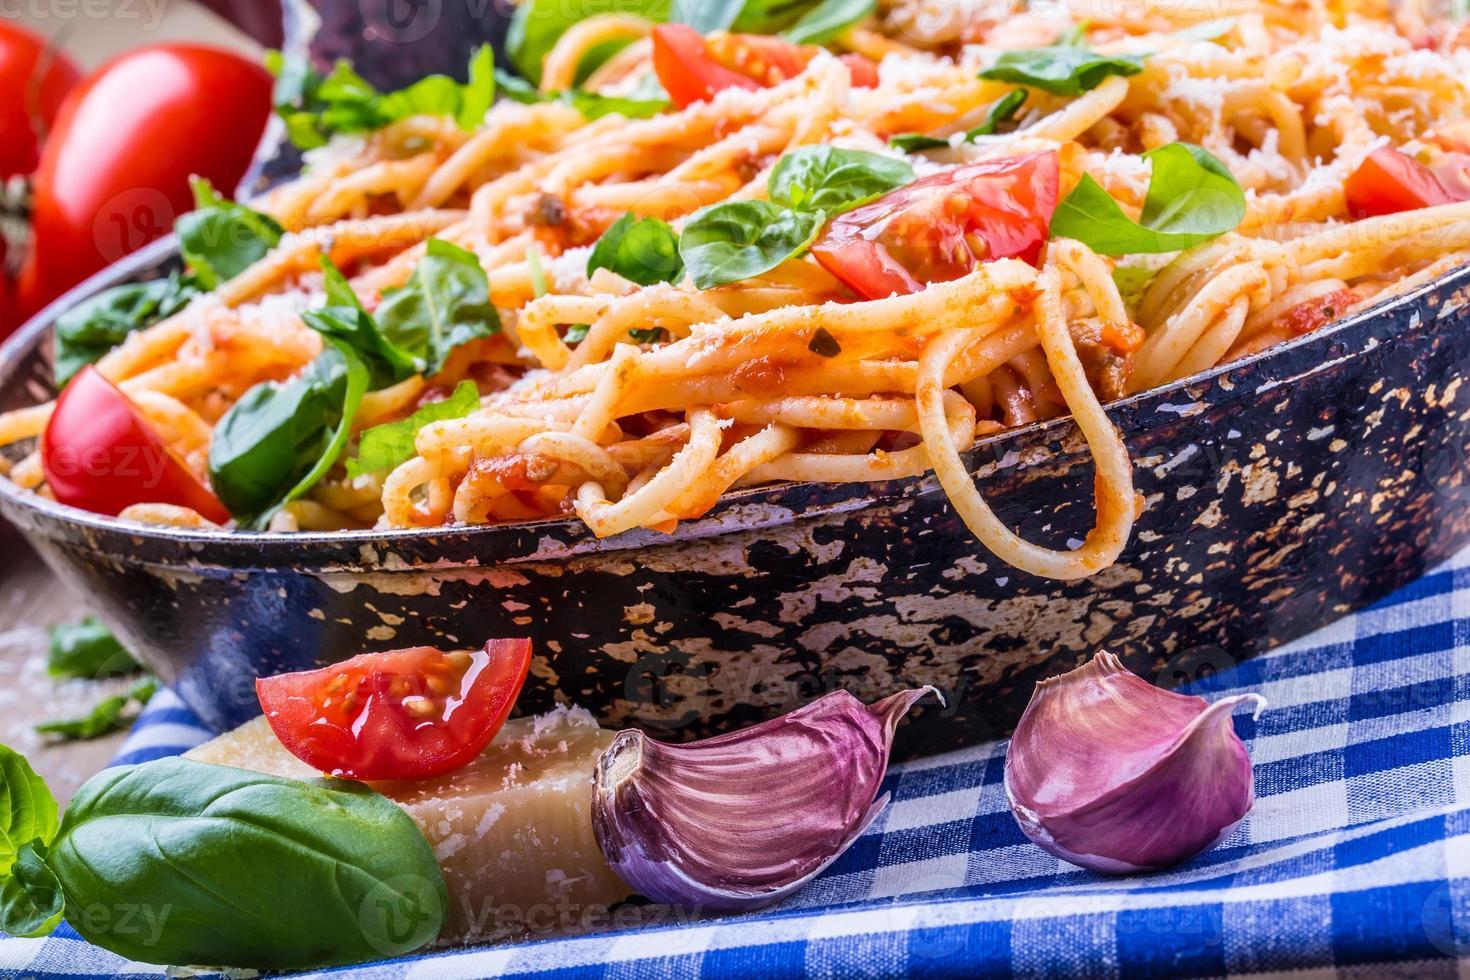 Spaghetti Bolognese mit Sherry-Tomate und Basilikum. foto